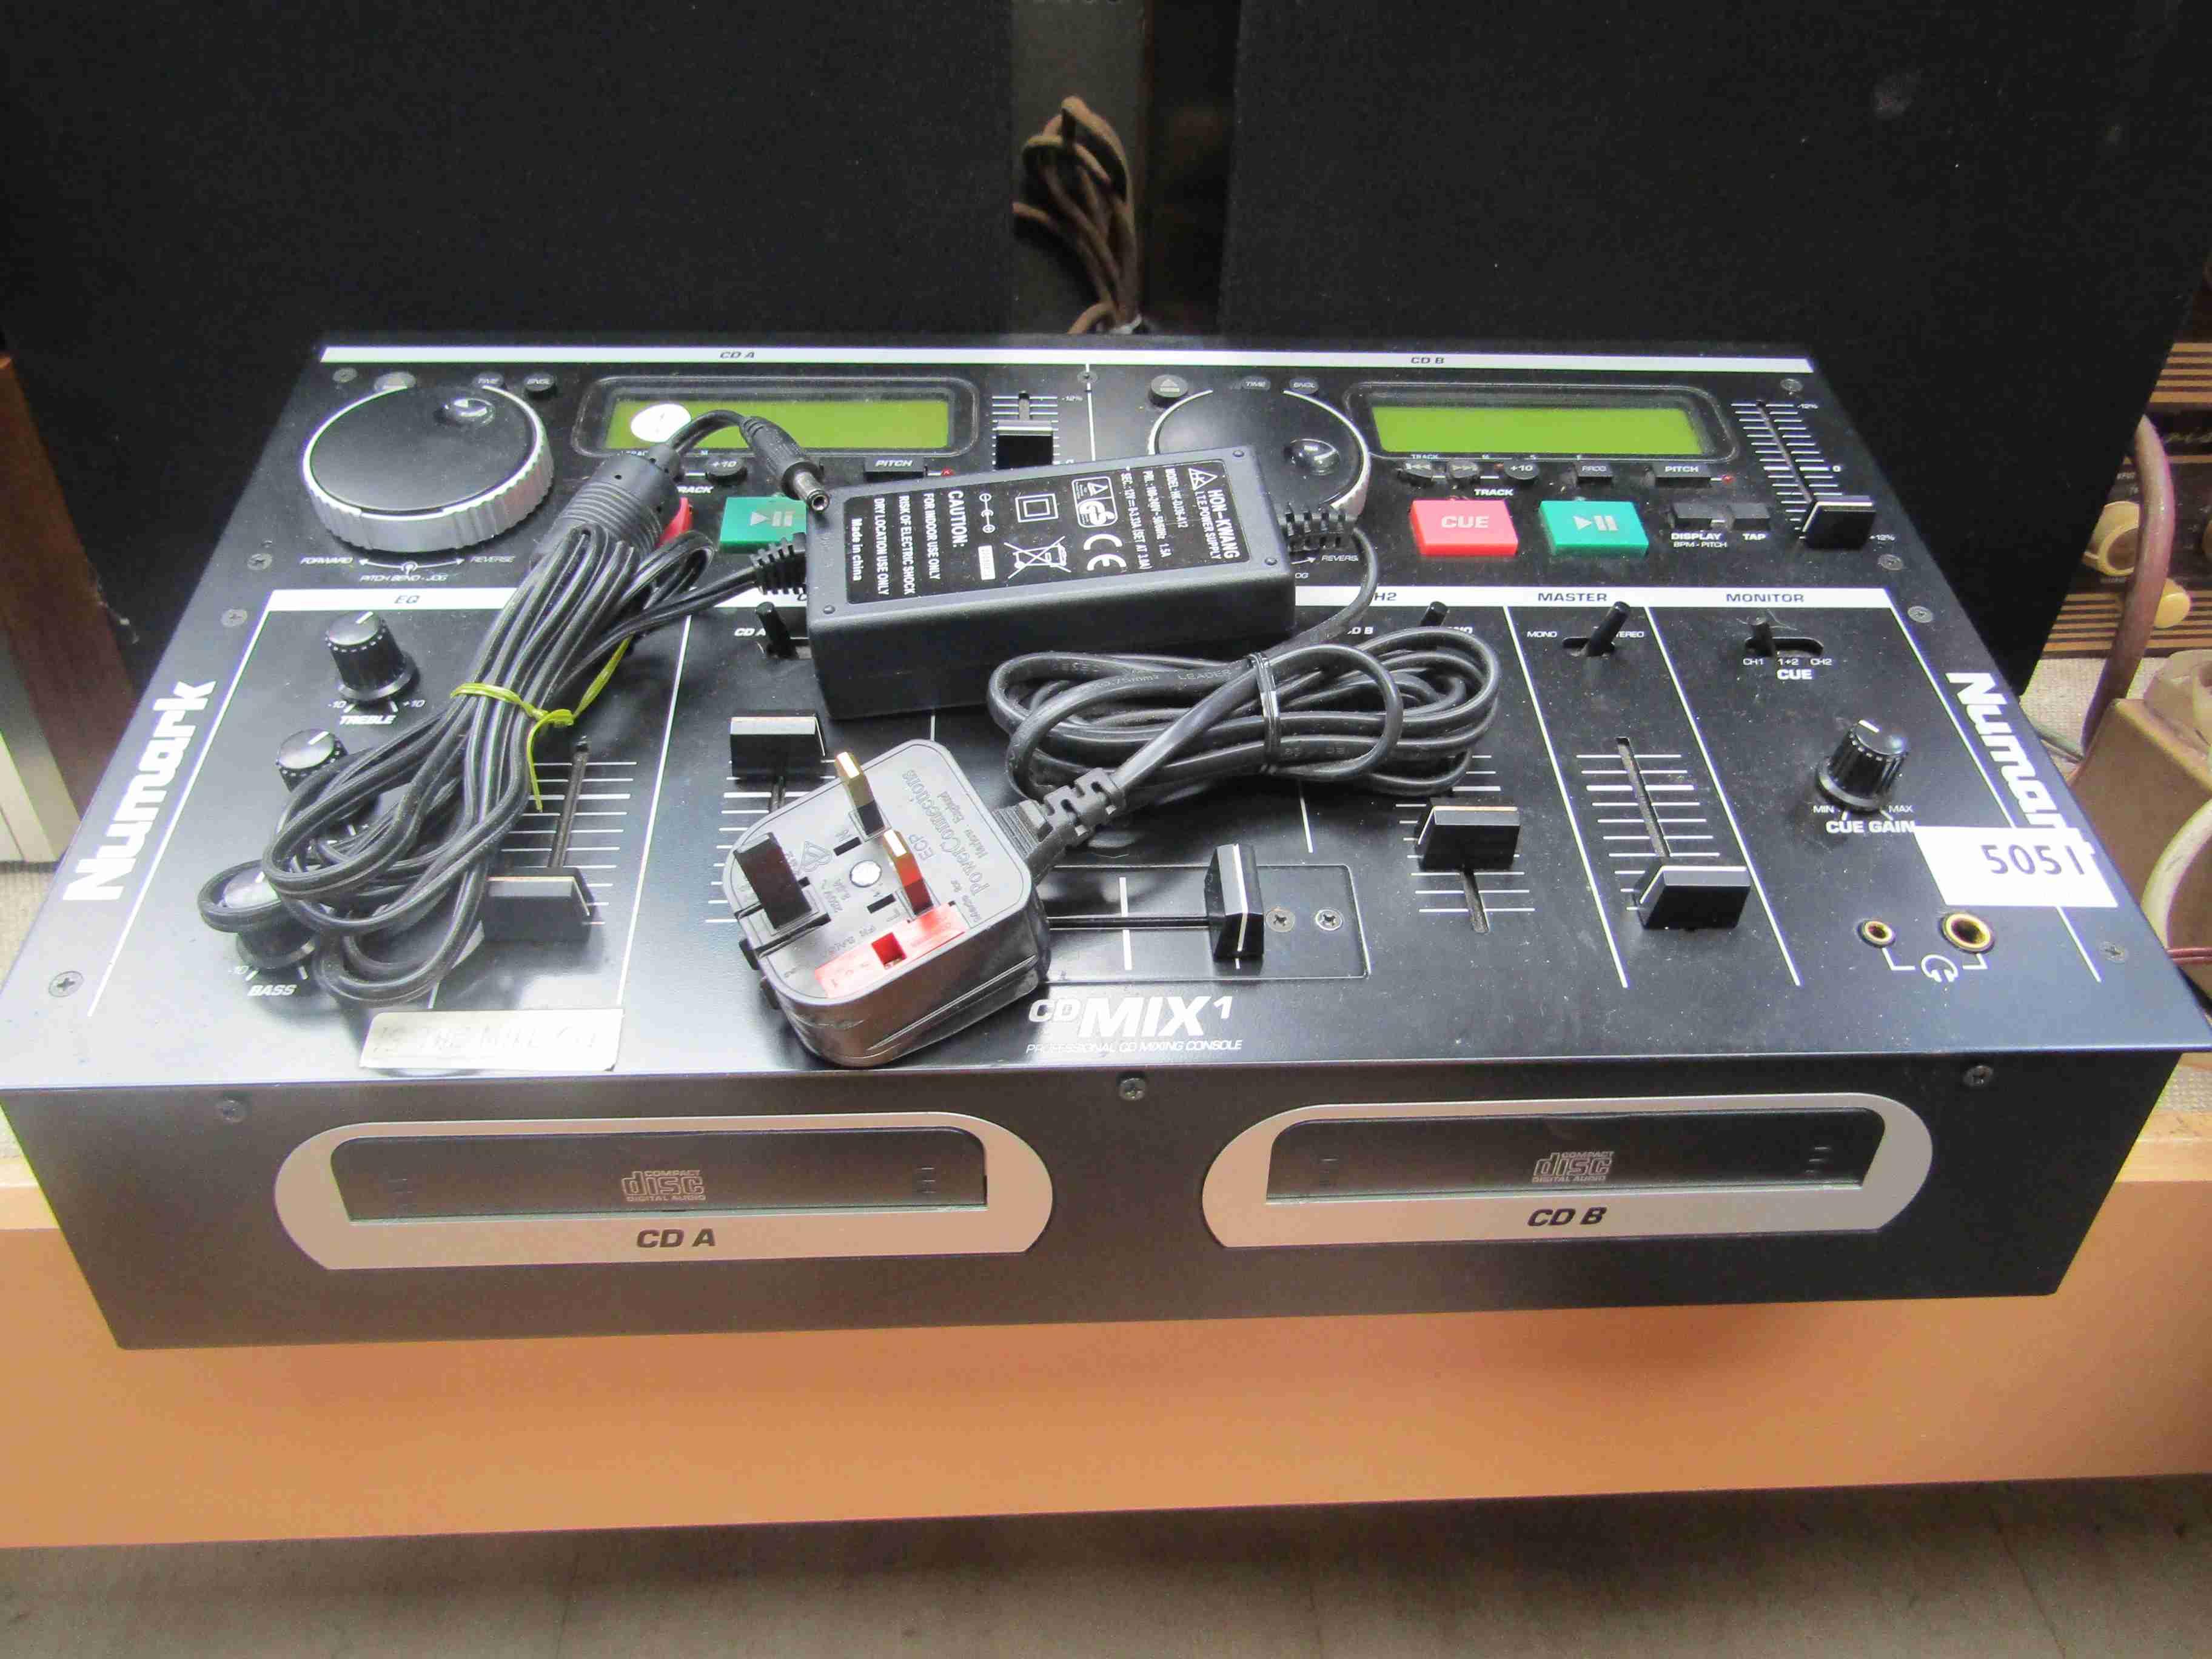 A Numark CDMIX1 professional CD mixing console